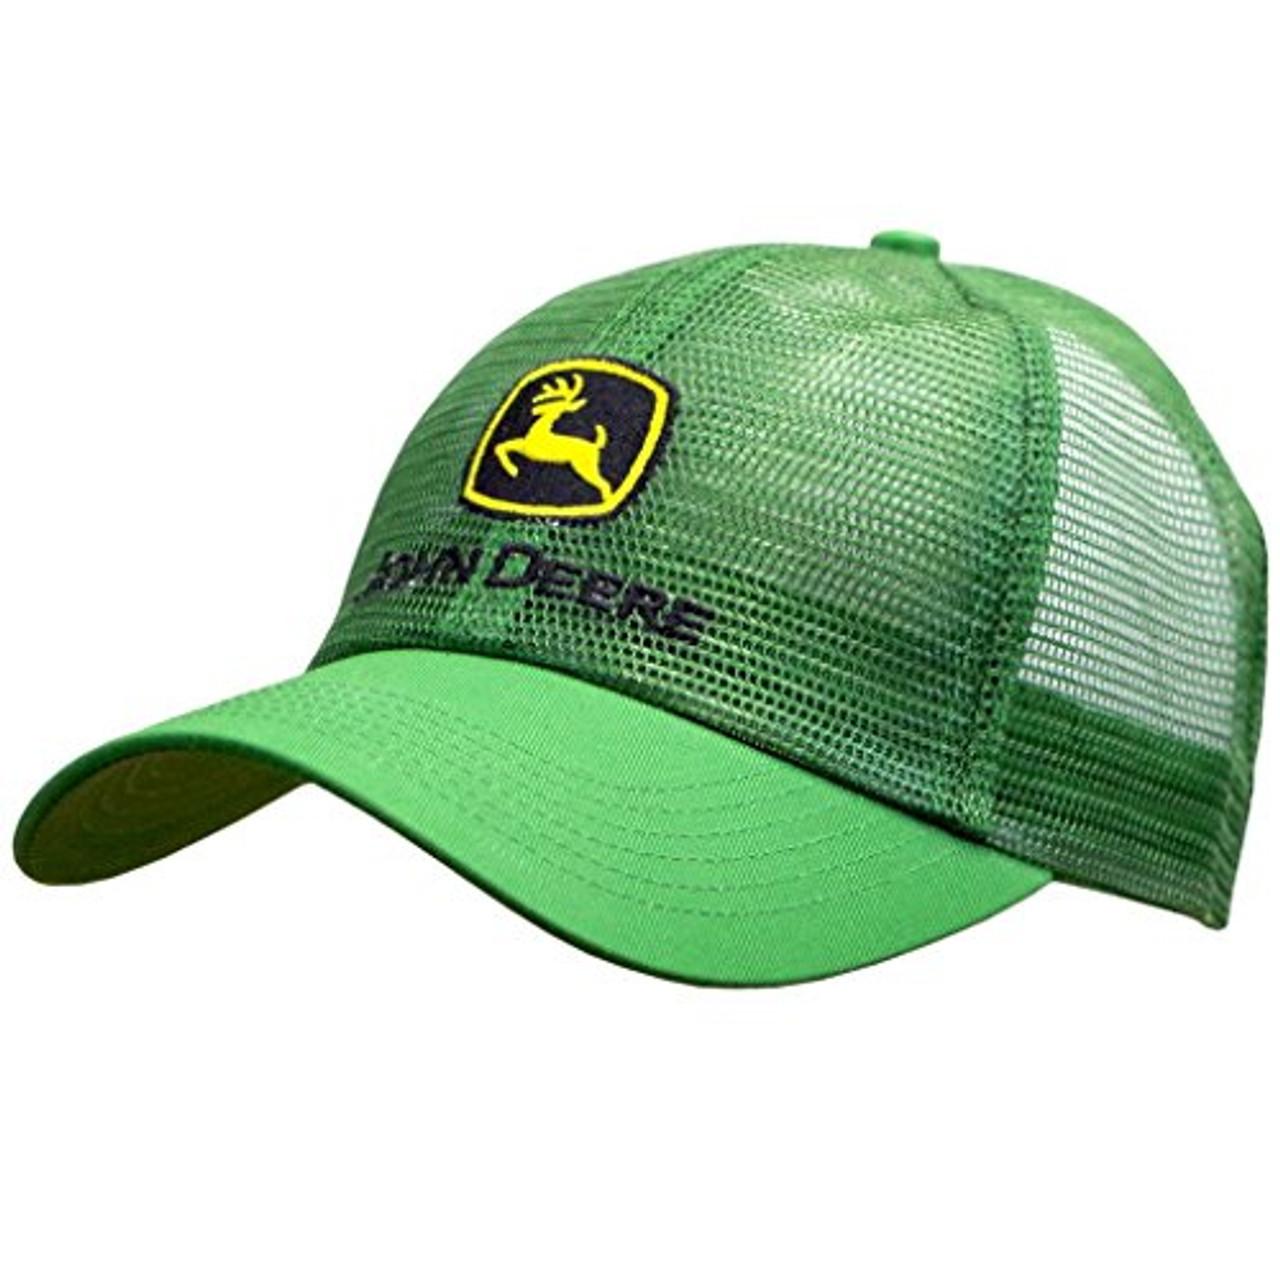 39812b46aca John Deere Classic Logo Mesh Cap - Trenz Shirt Company